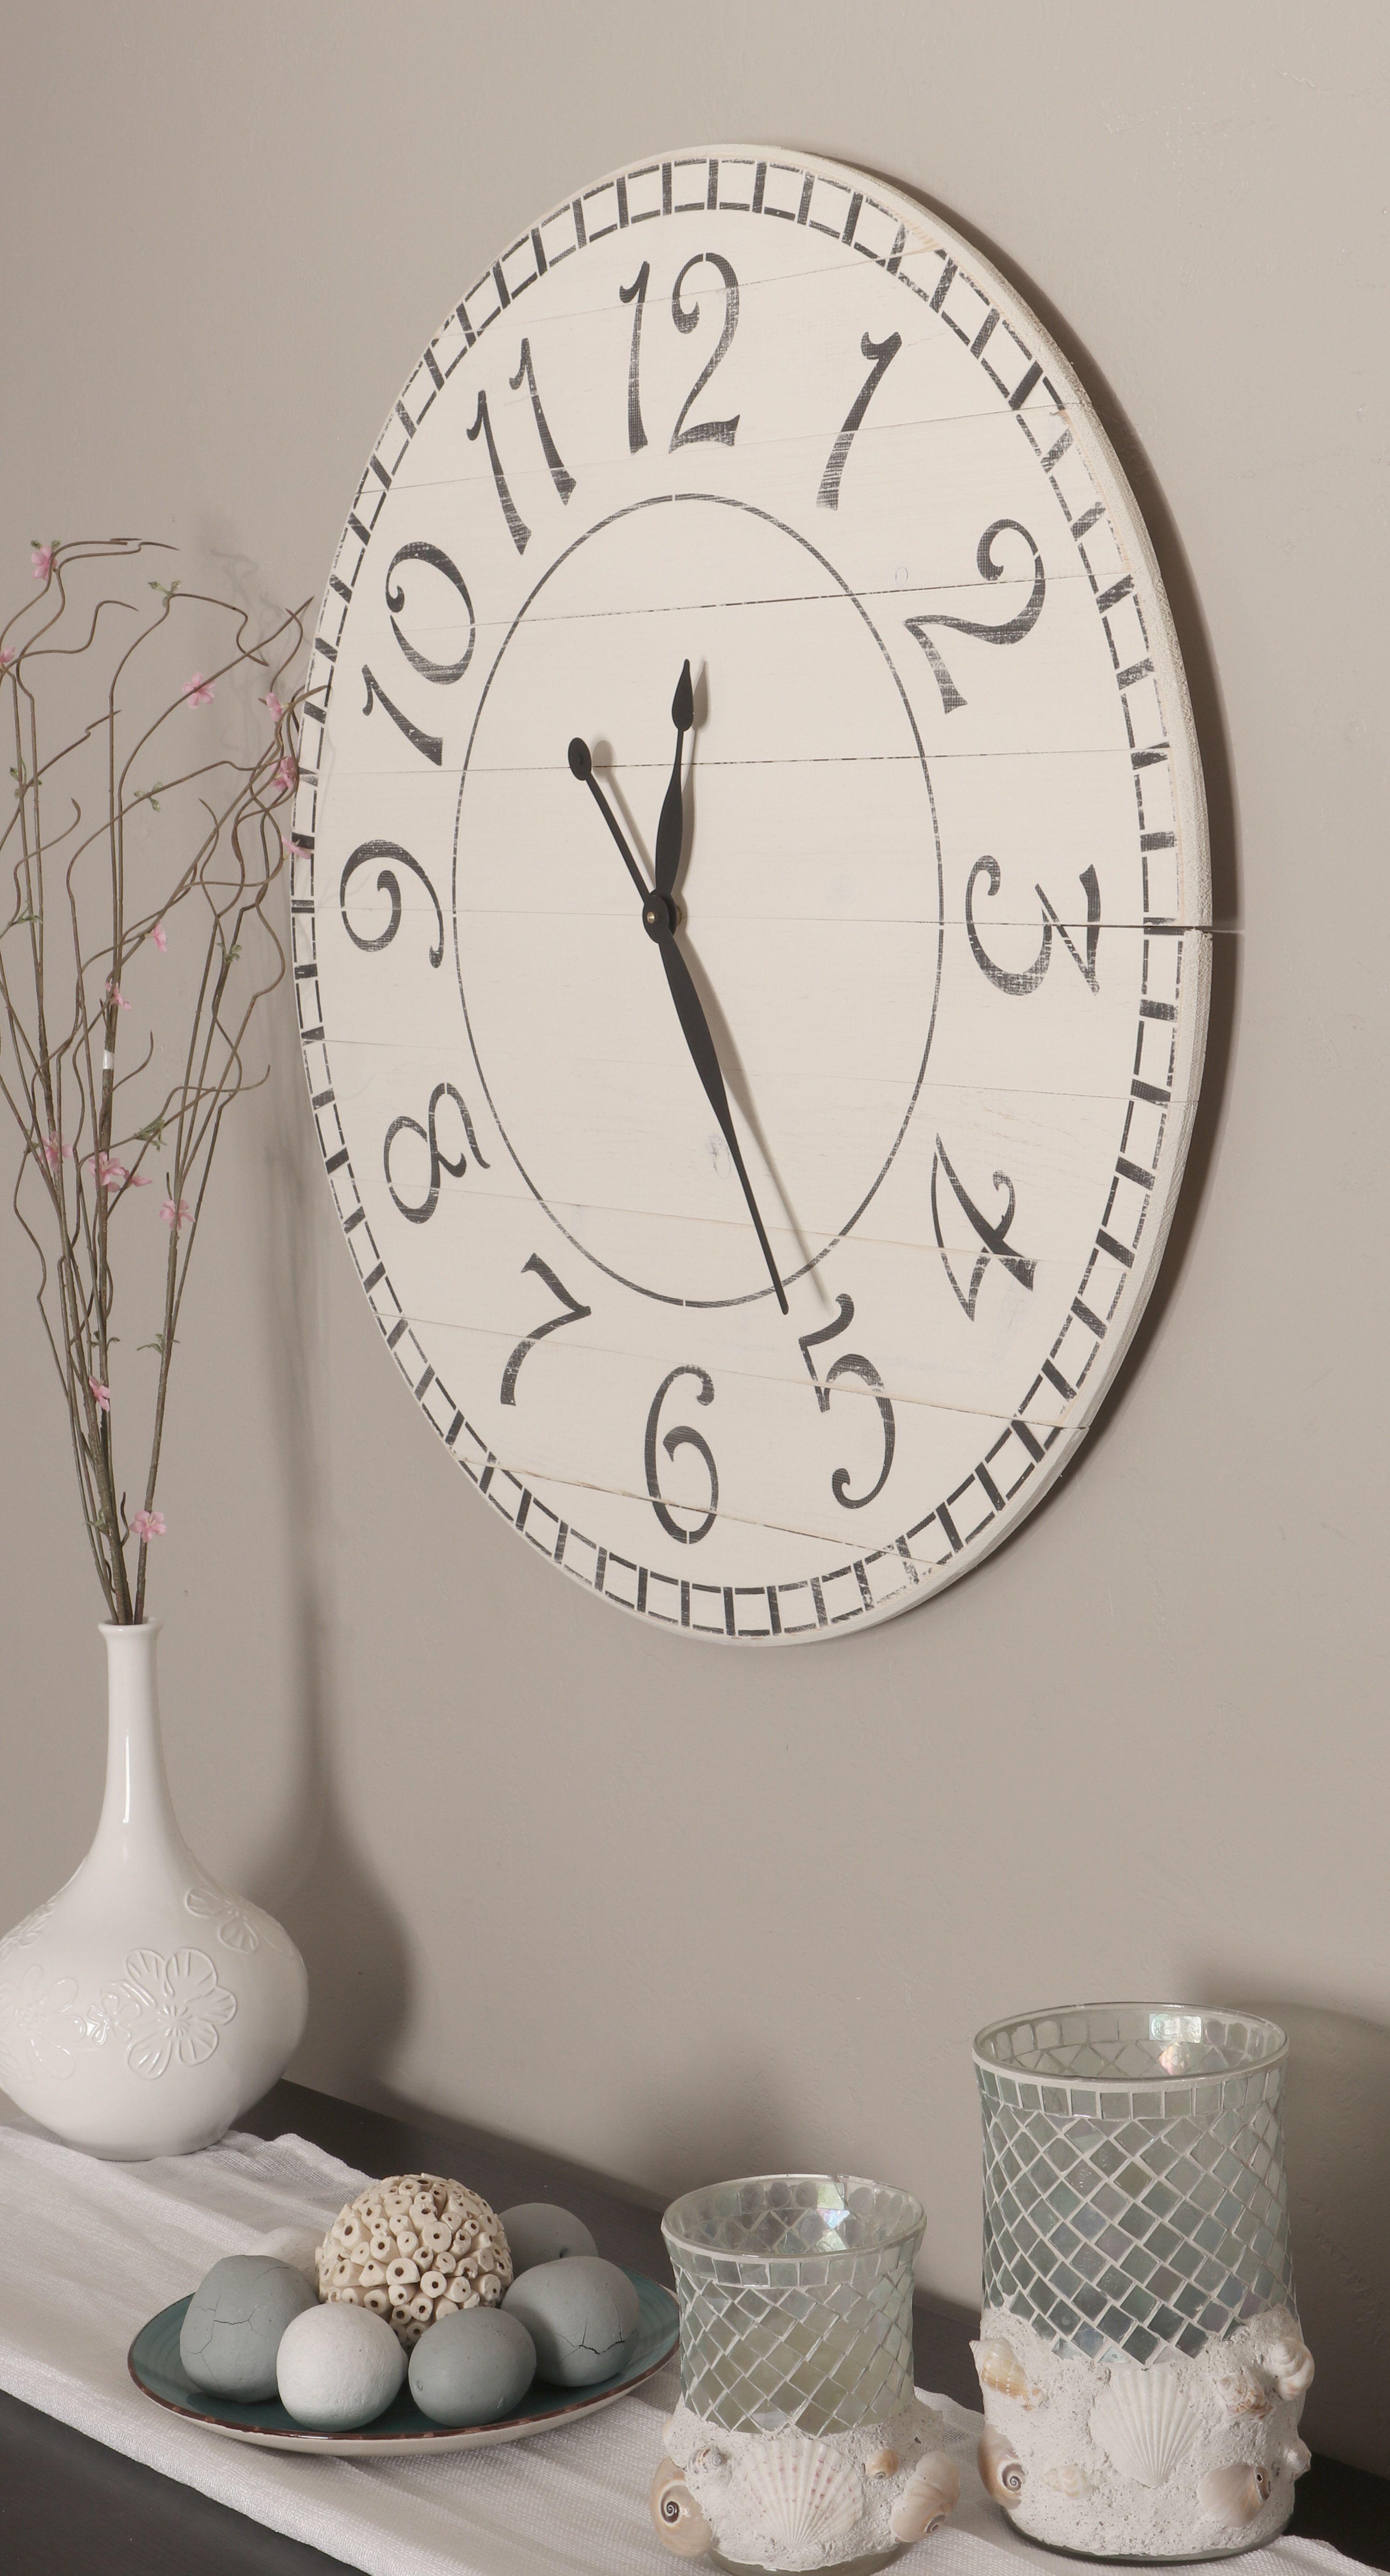 Oversized Negron Antique Farmhouse Wall Clock Wall Clocks Living Room Clock Wall Clock